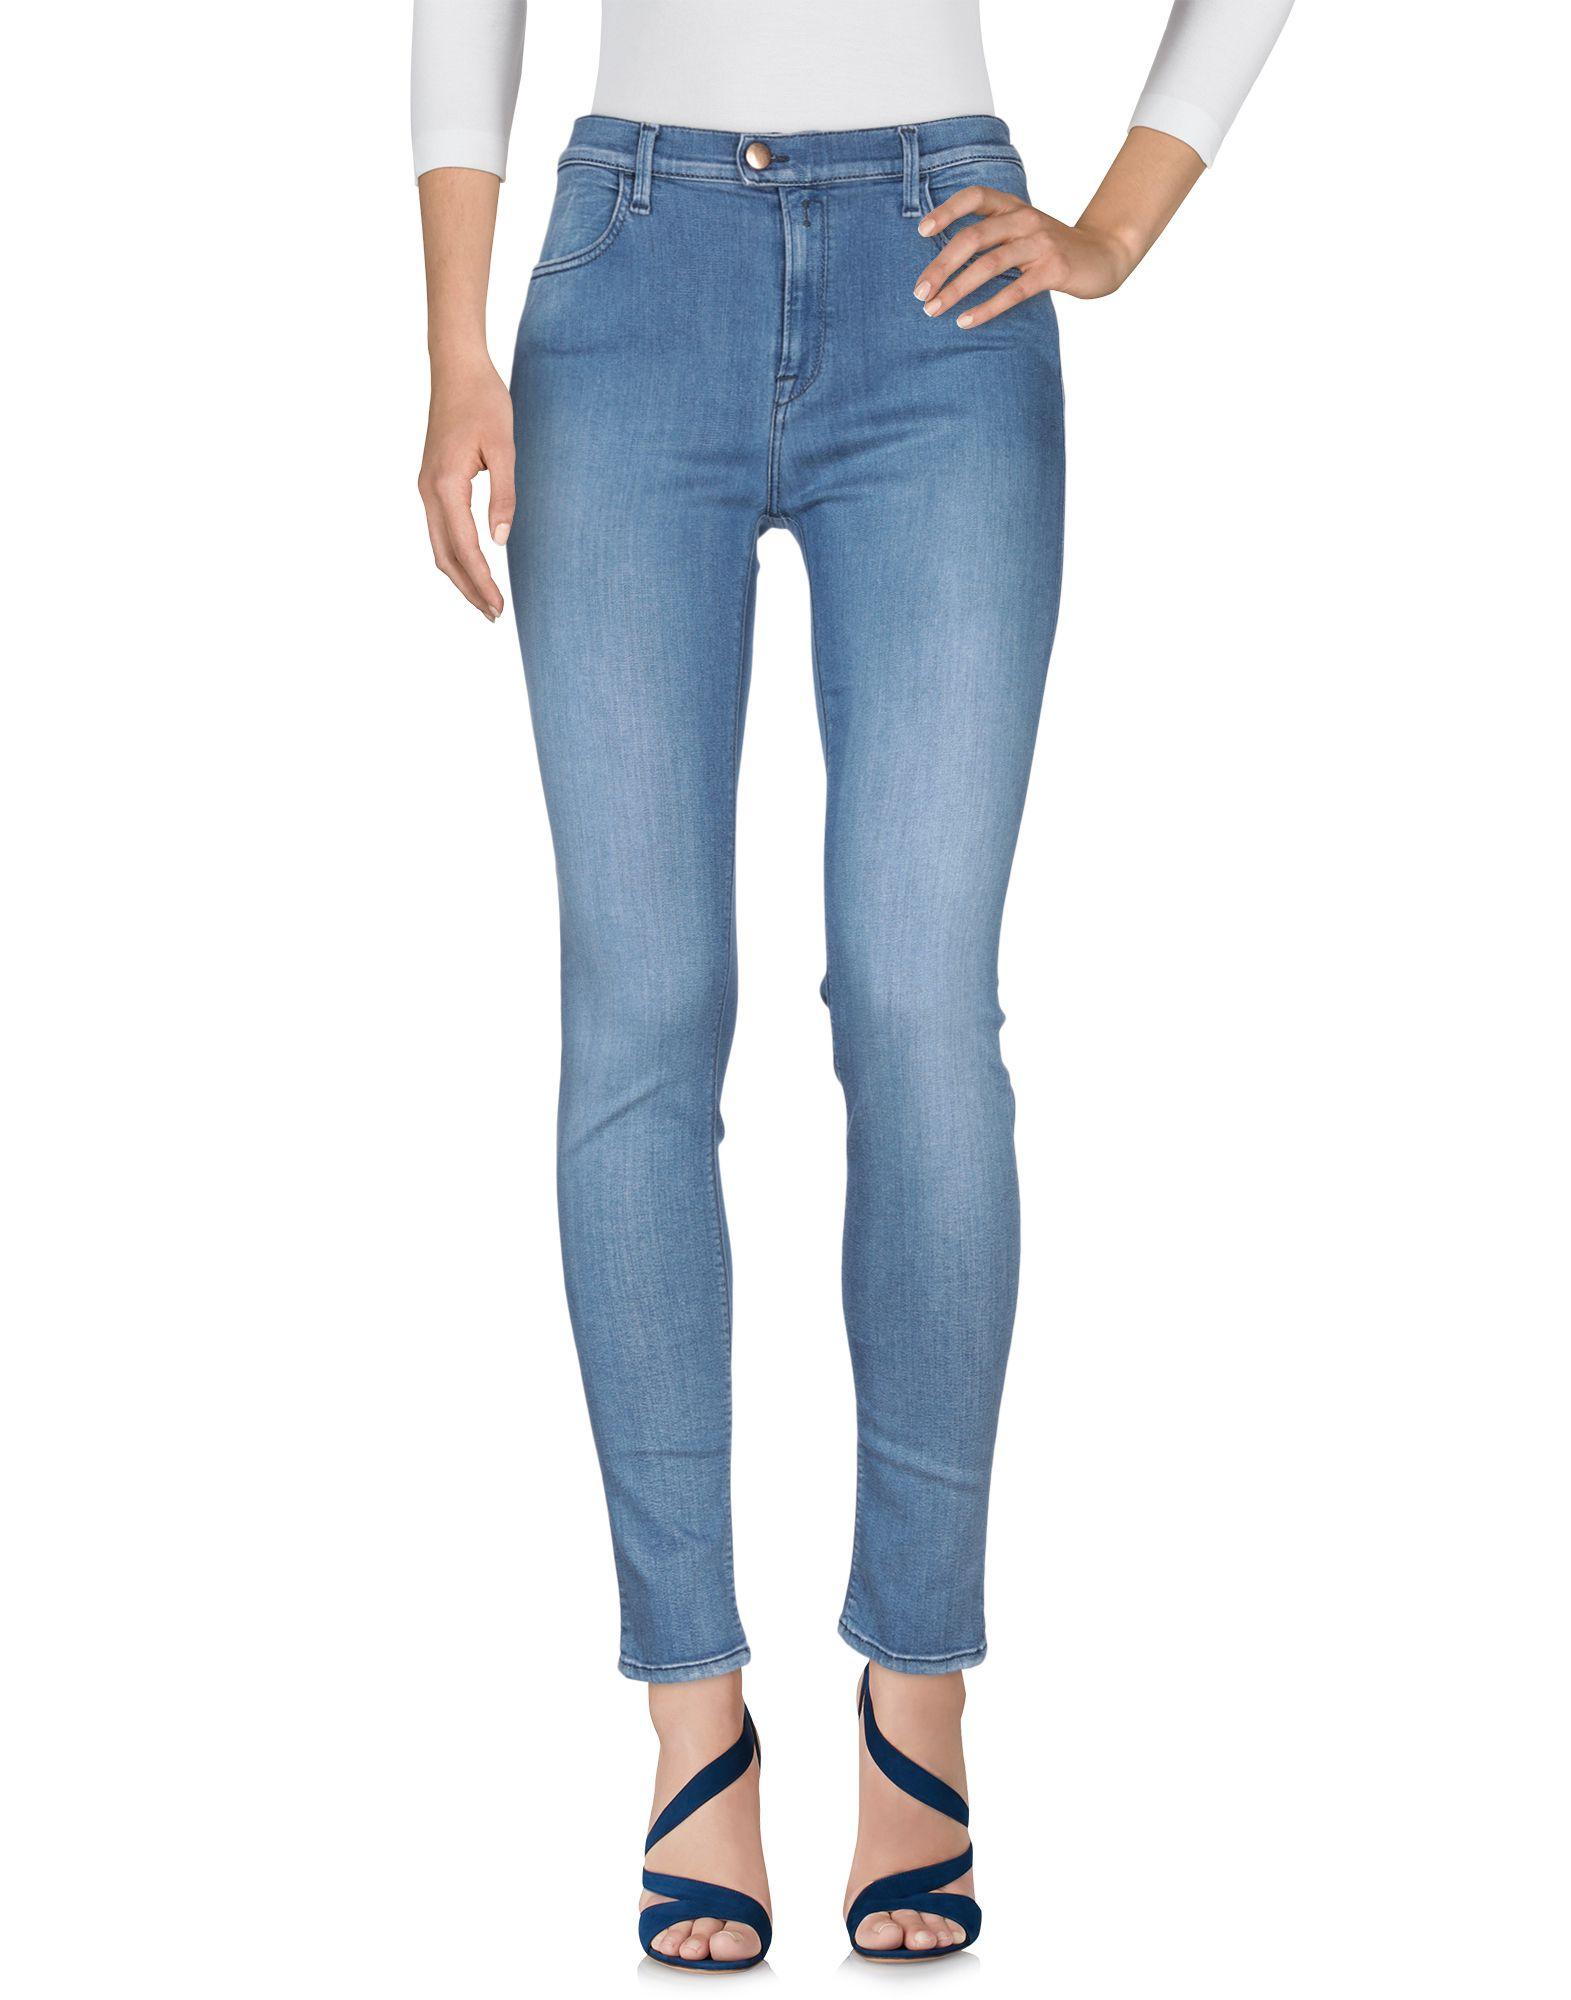 Pantaloni Jeans Replay Replay donna - 42689403WQ